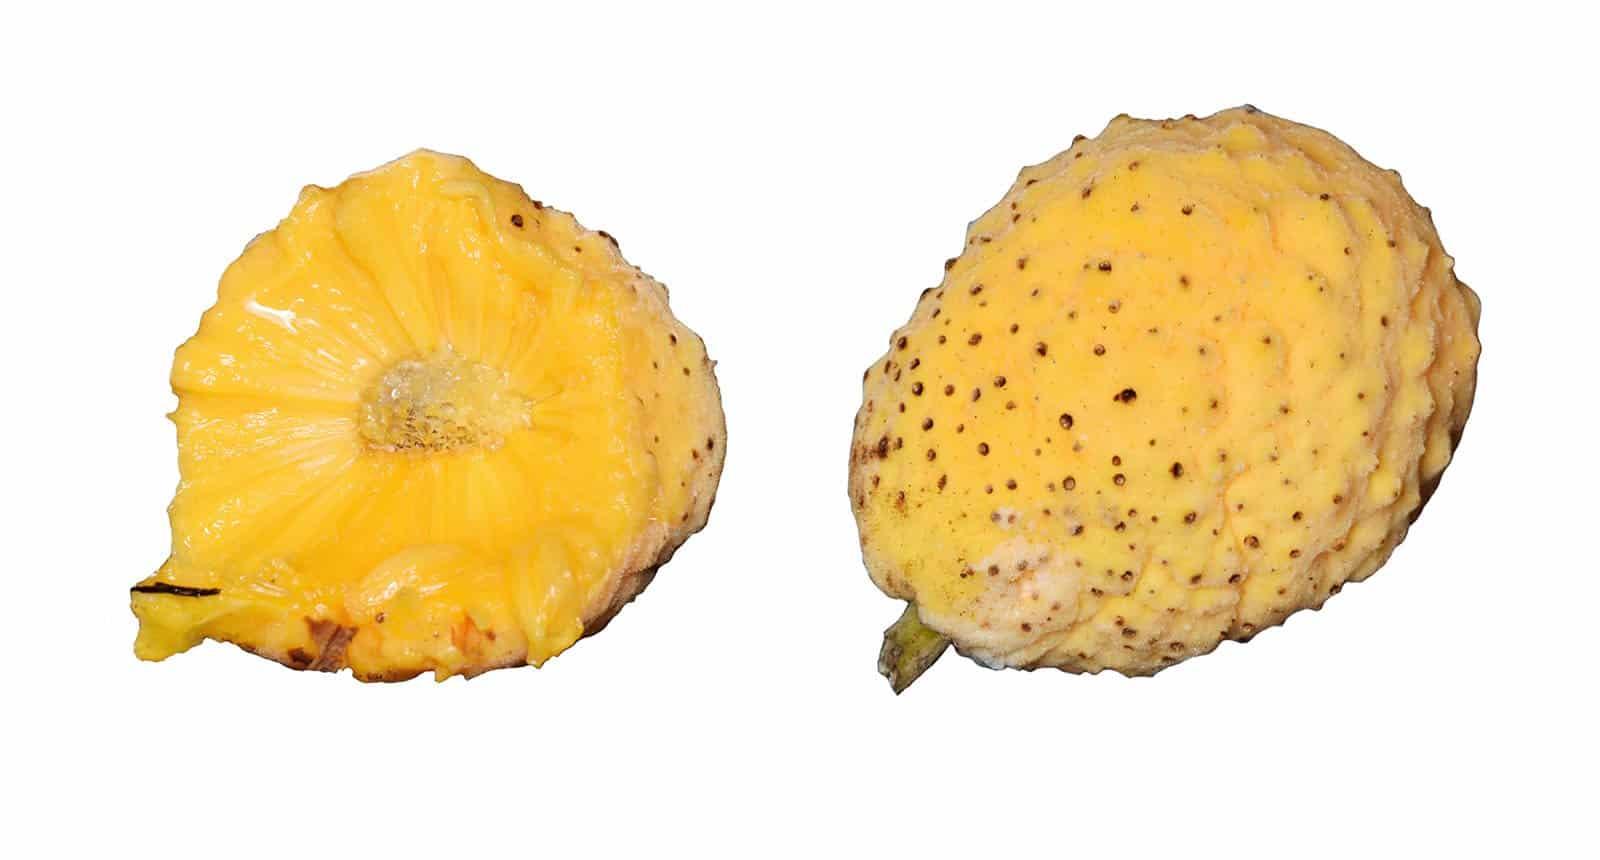 Artocarpus Hypargyreus